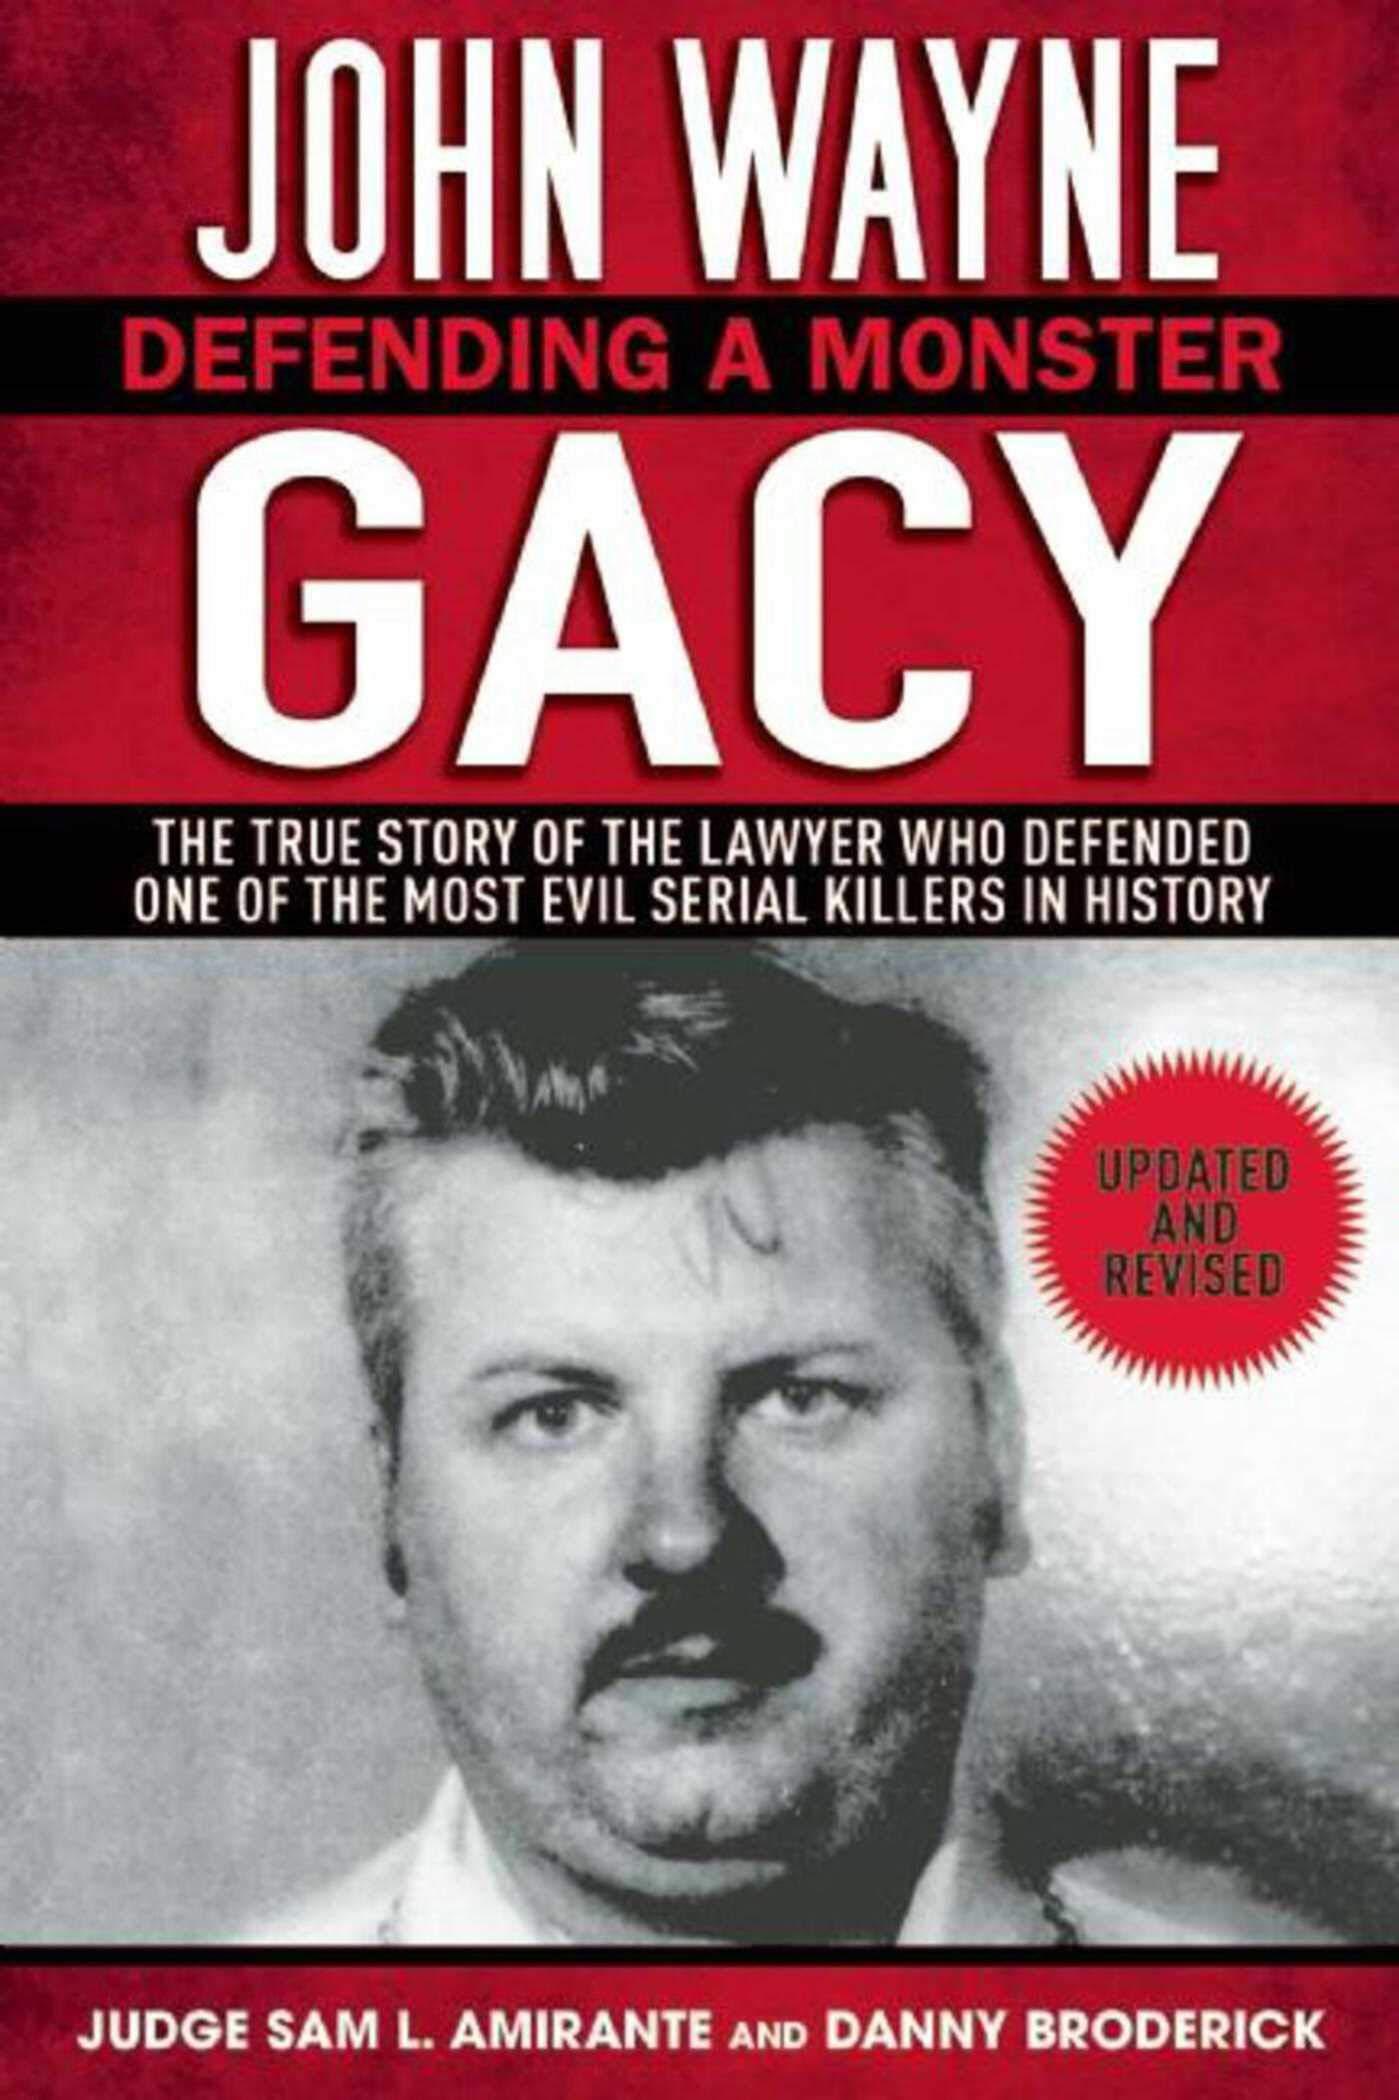 John Wayne Gacy: Defending a Monster: The True Story of the